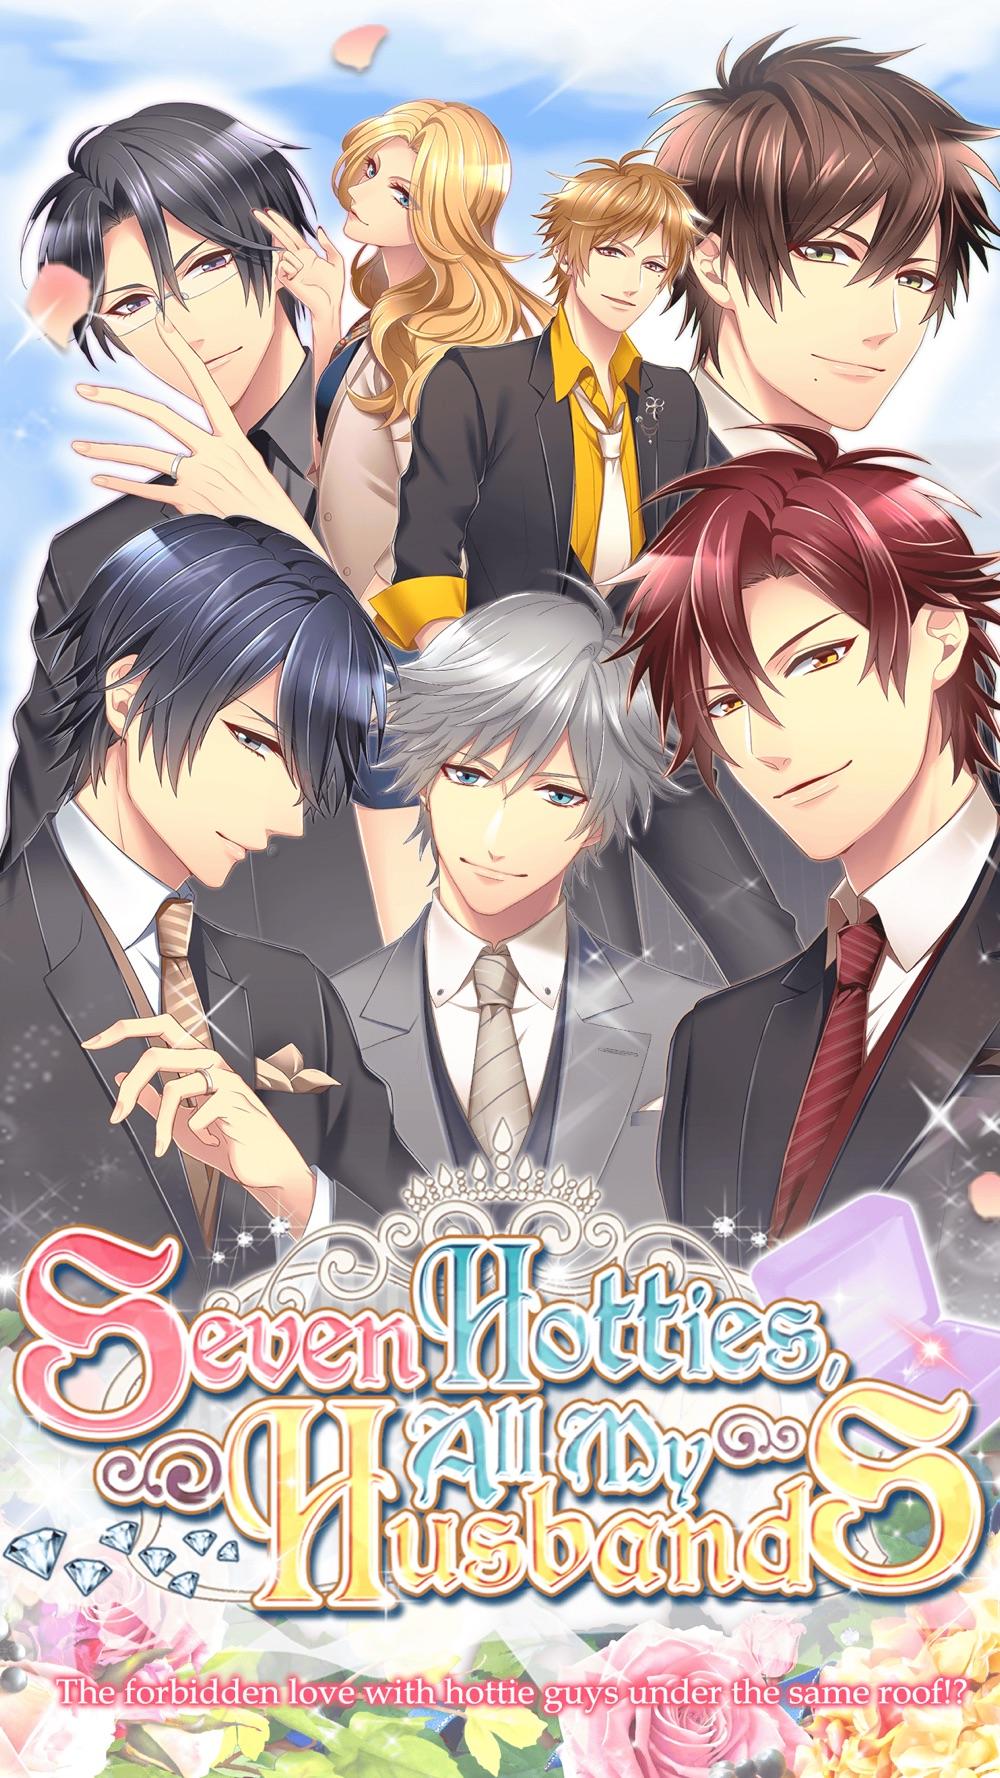 Seven Hotties, All My Husbands hack tool